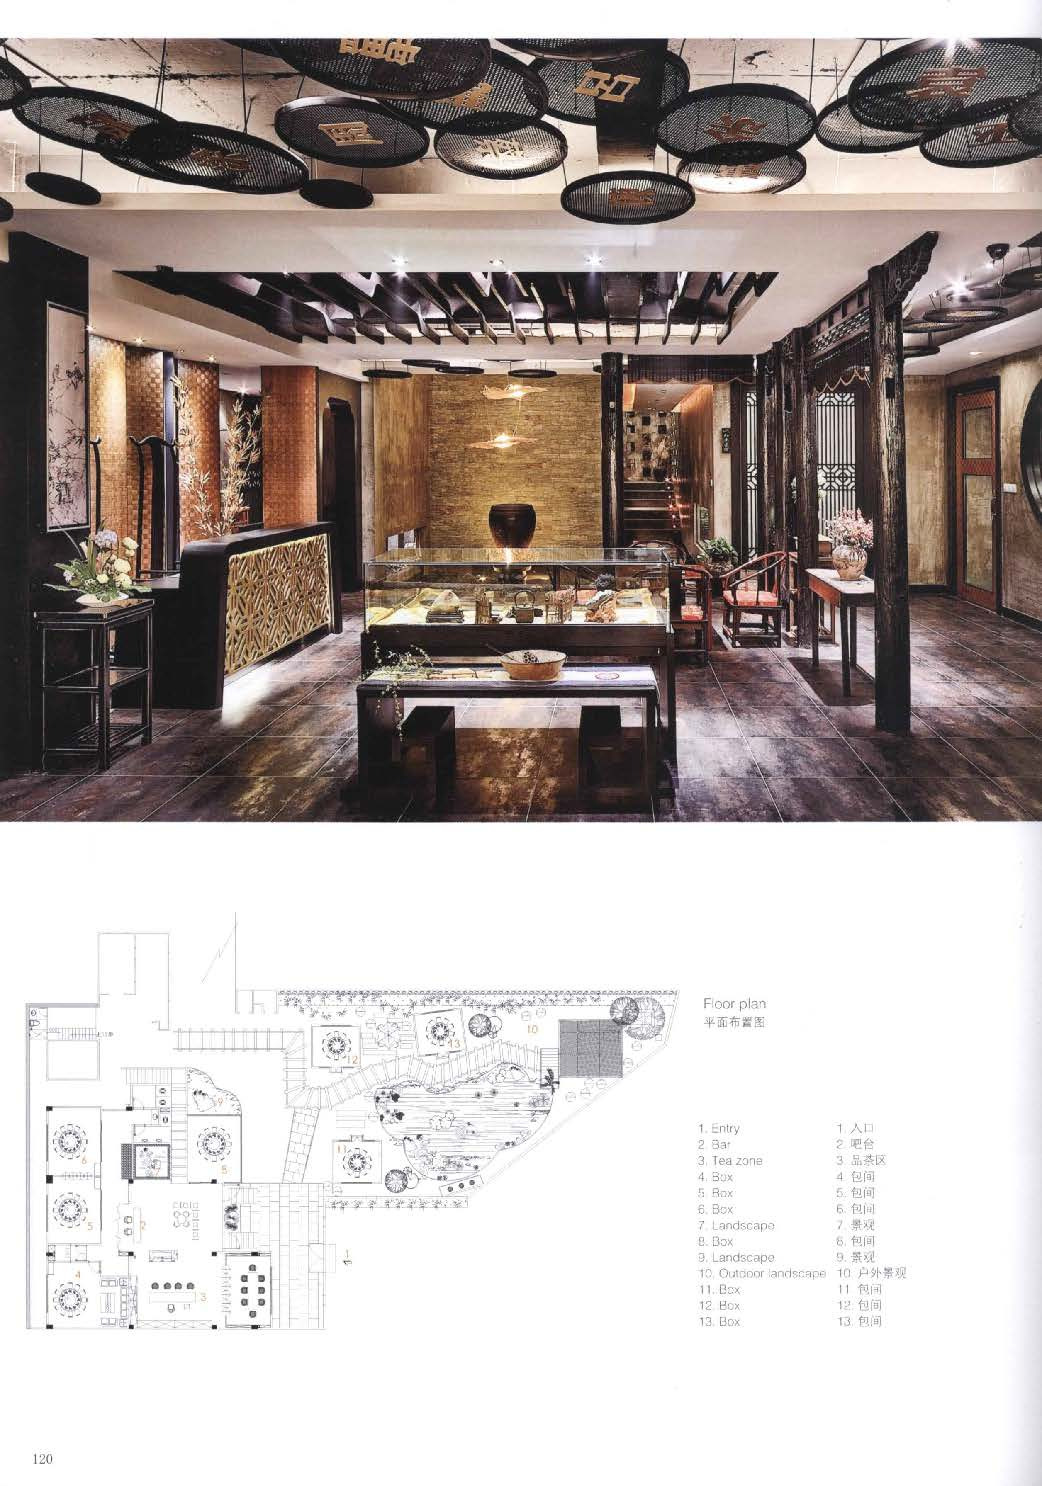 H073 东方风情 会所、餐饮细部解析_Page_118.jpg